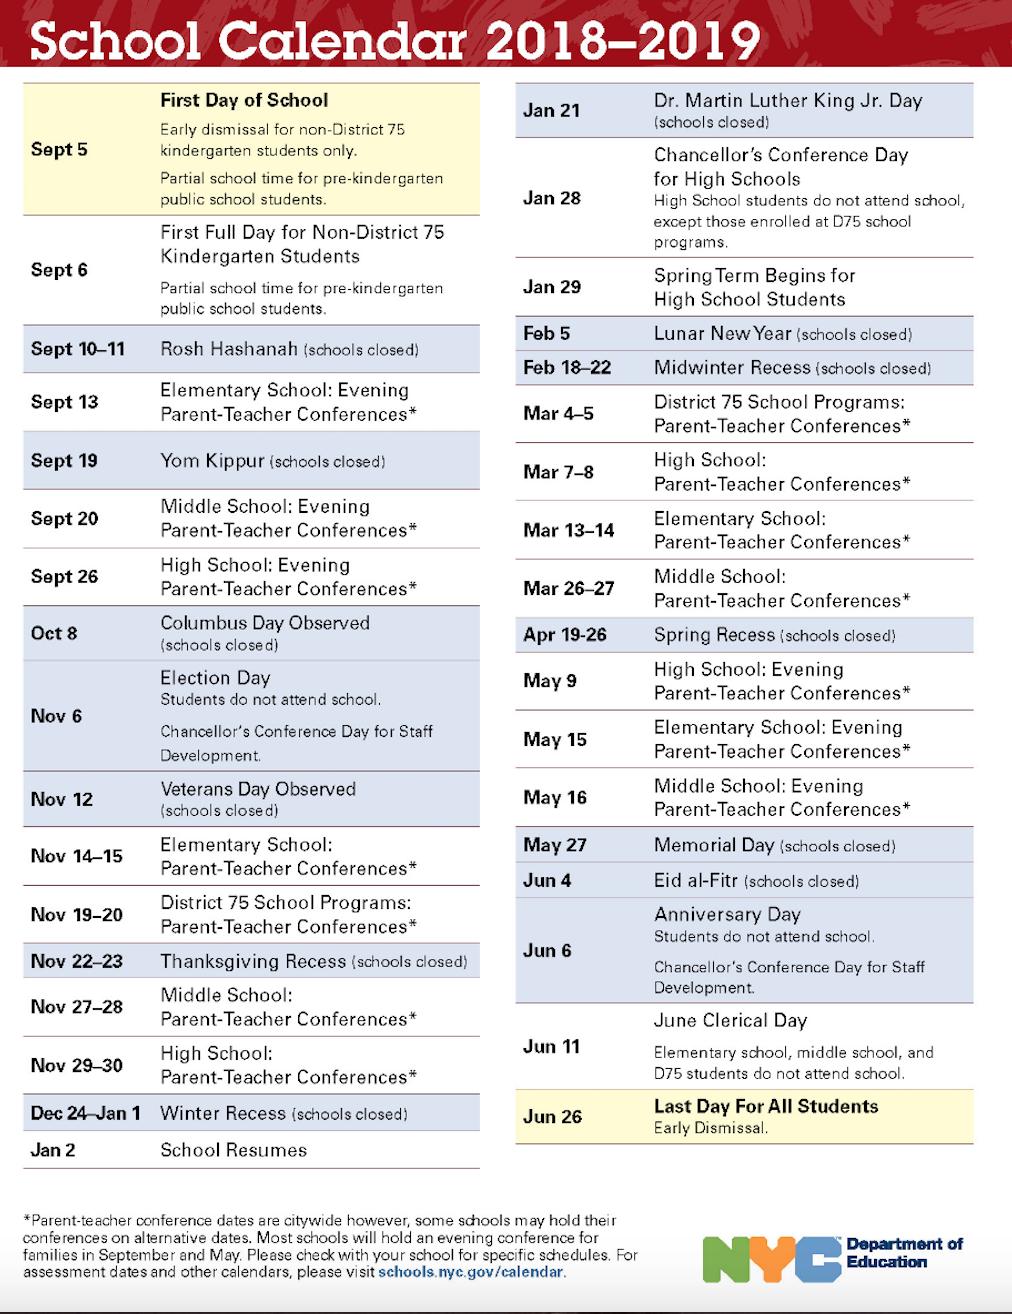 Nyc Doe 2018 2019 School Calendar | Ps 373R Robert Randall Regarding Board Of Education Calendar Nyc